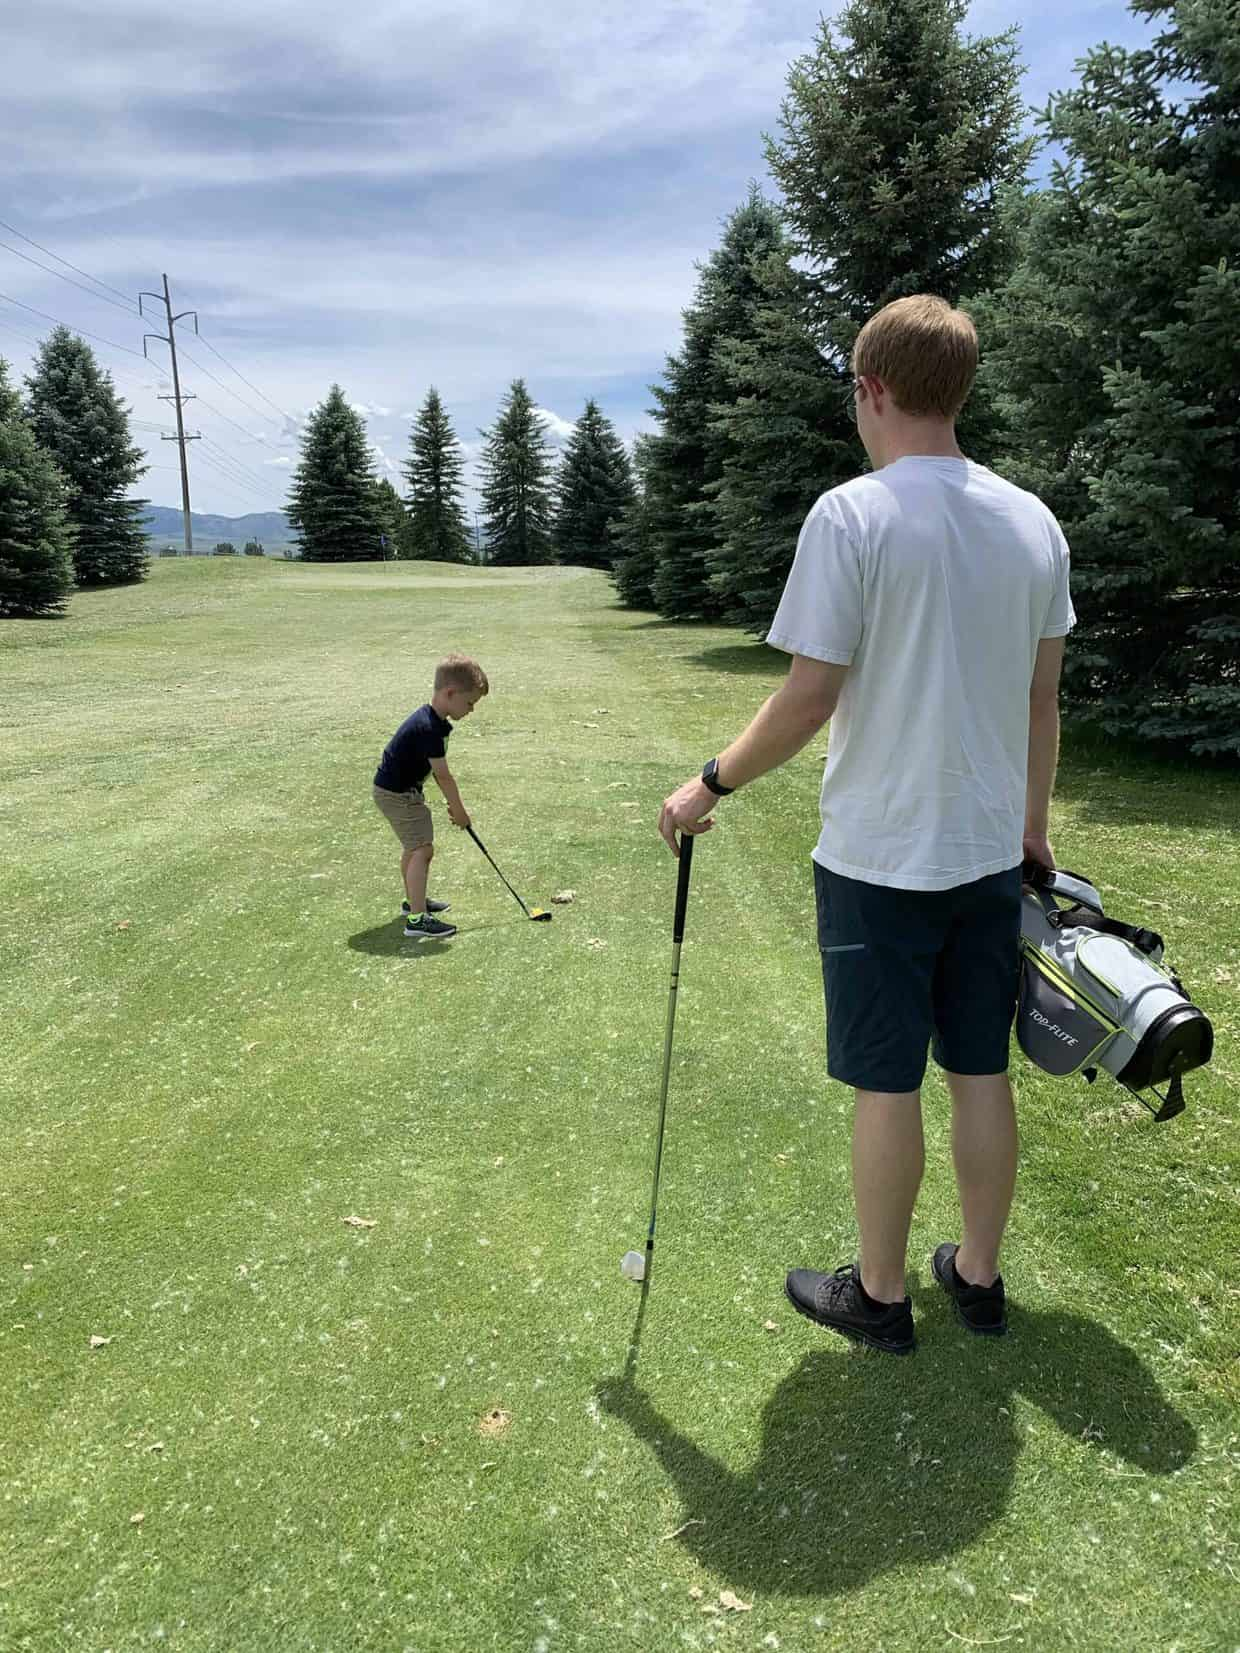 A young boy golfing.